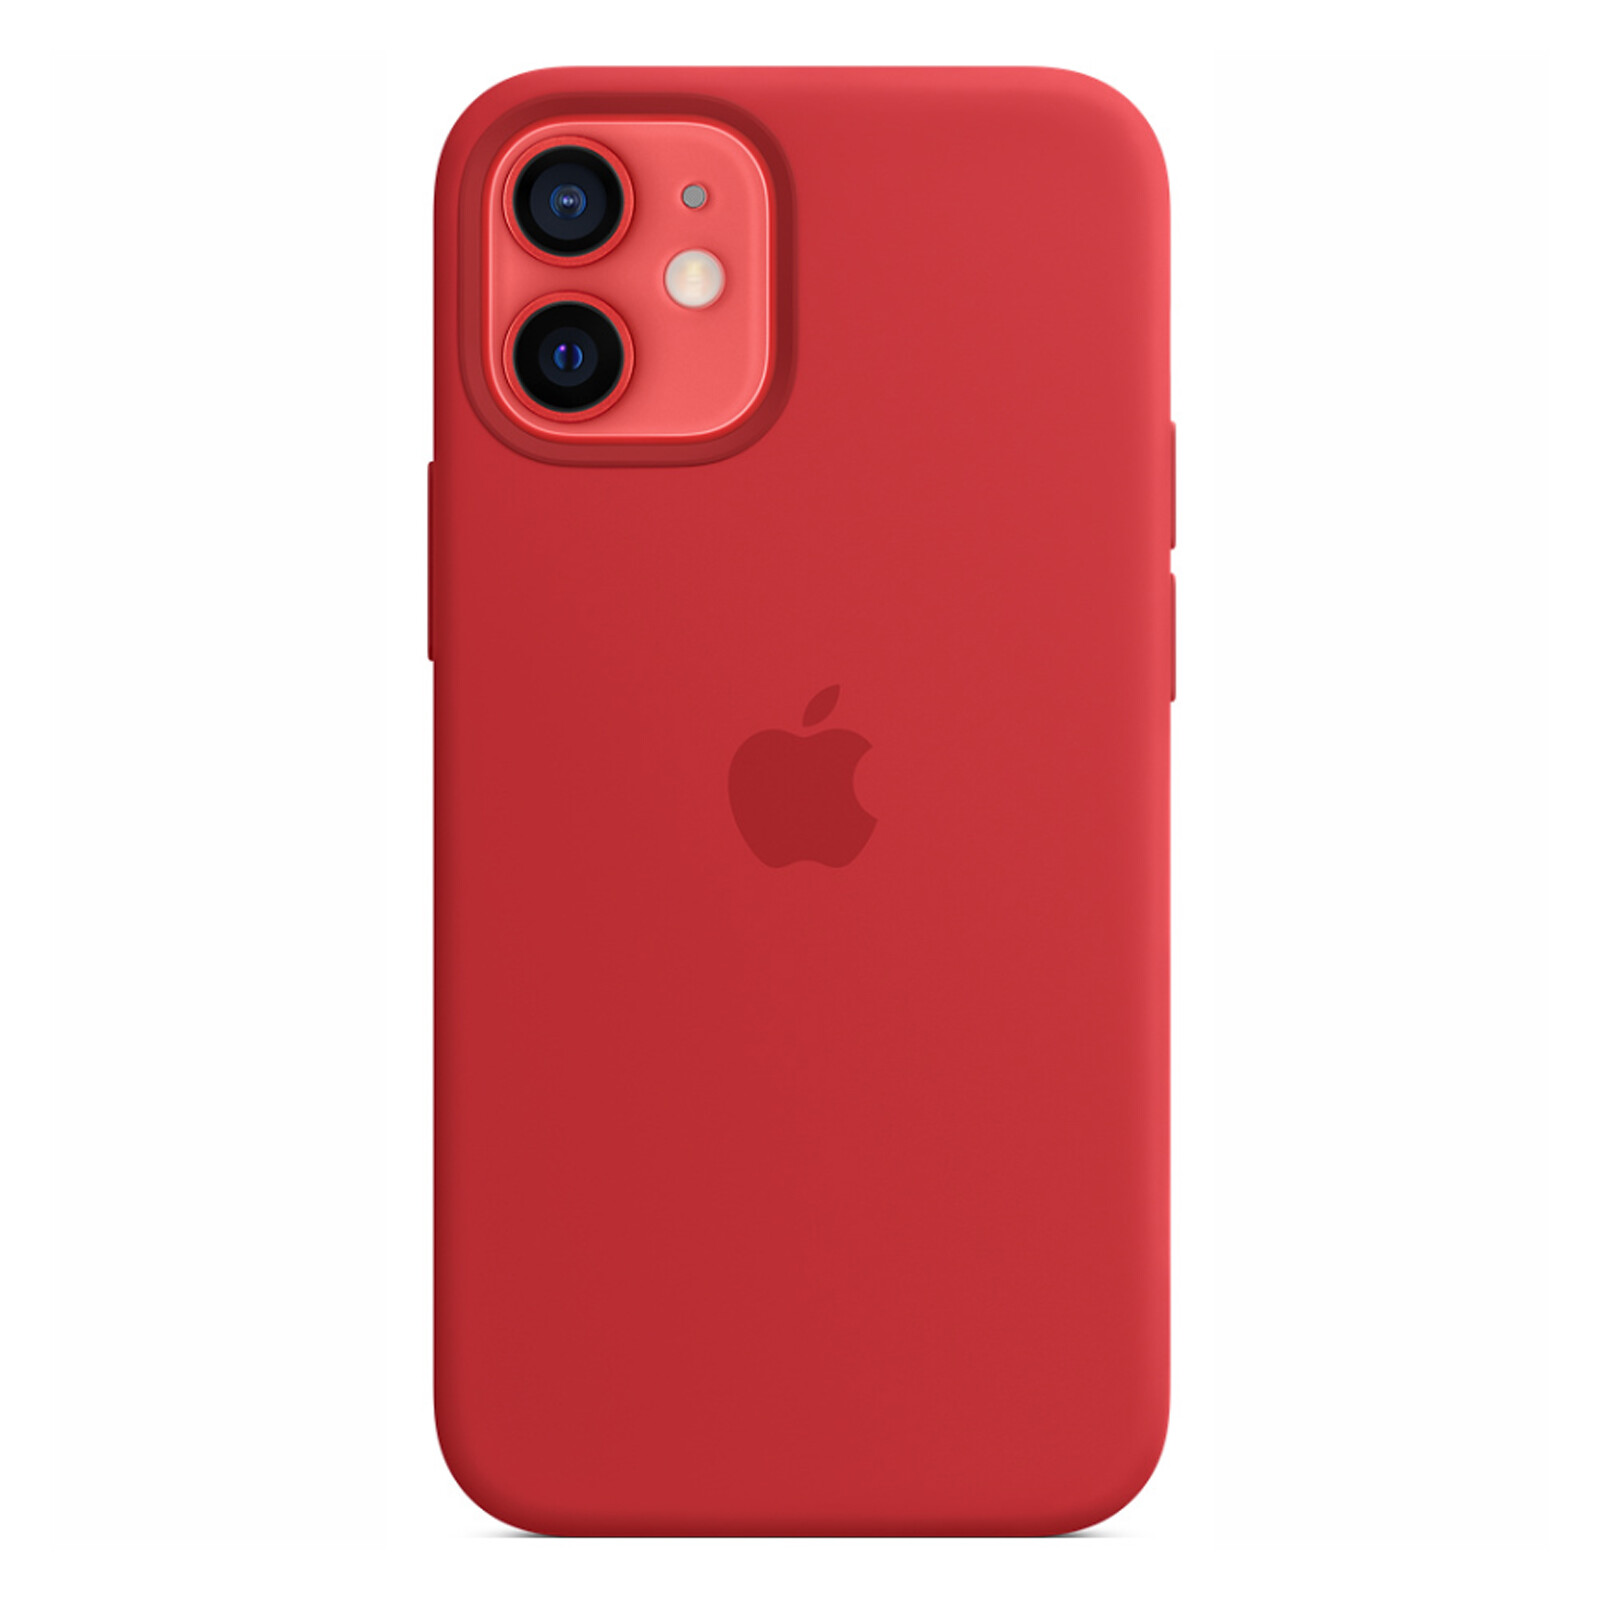 Apple iPhone 12 mini Silikon Case mit MagSafe rot